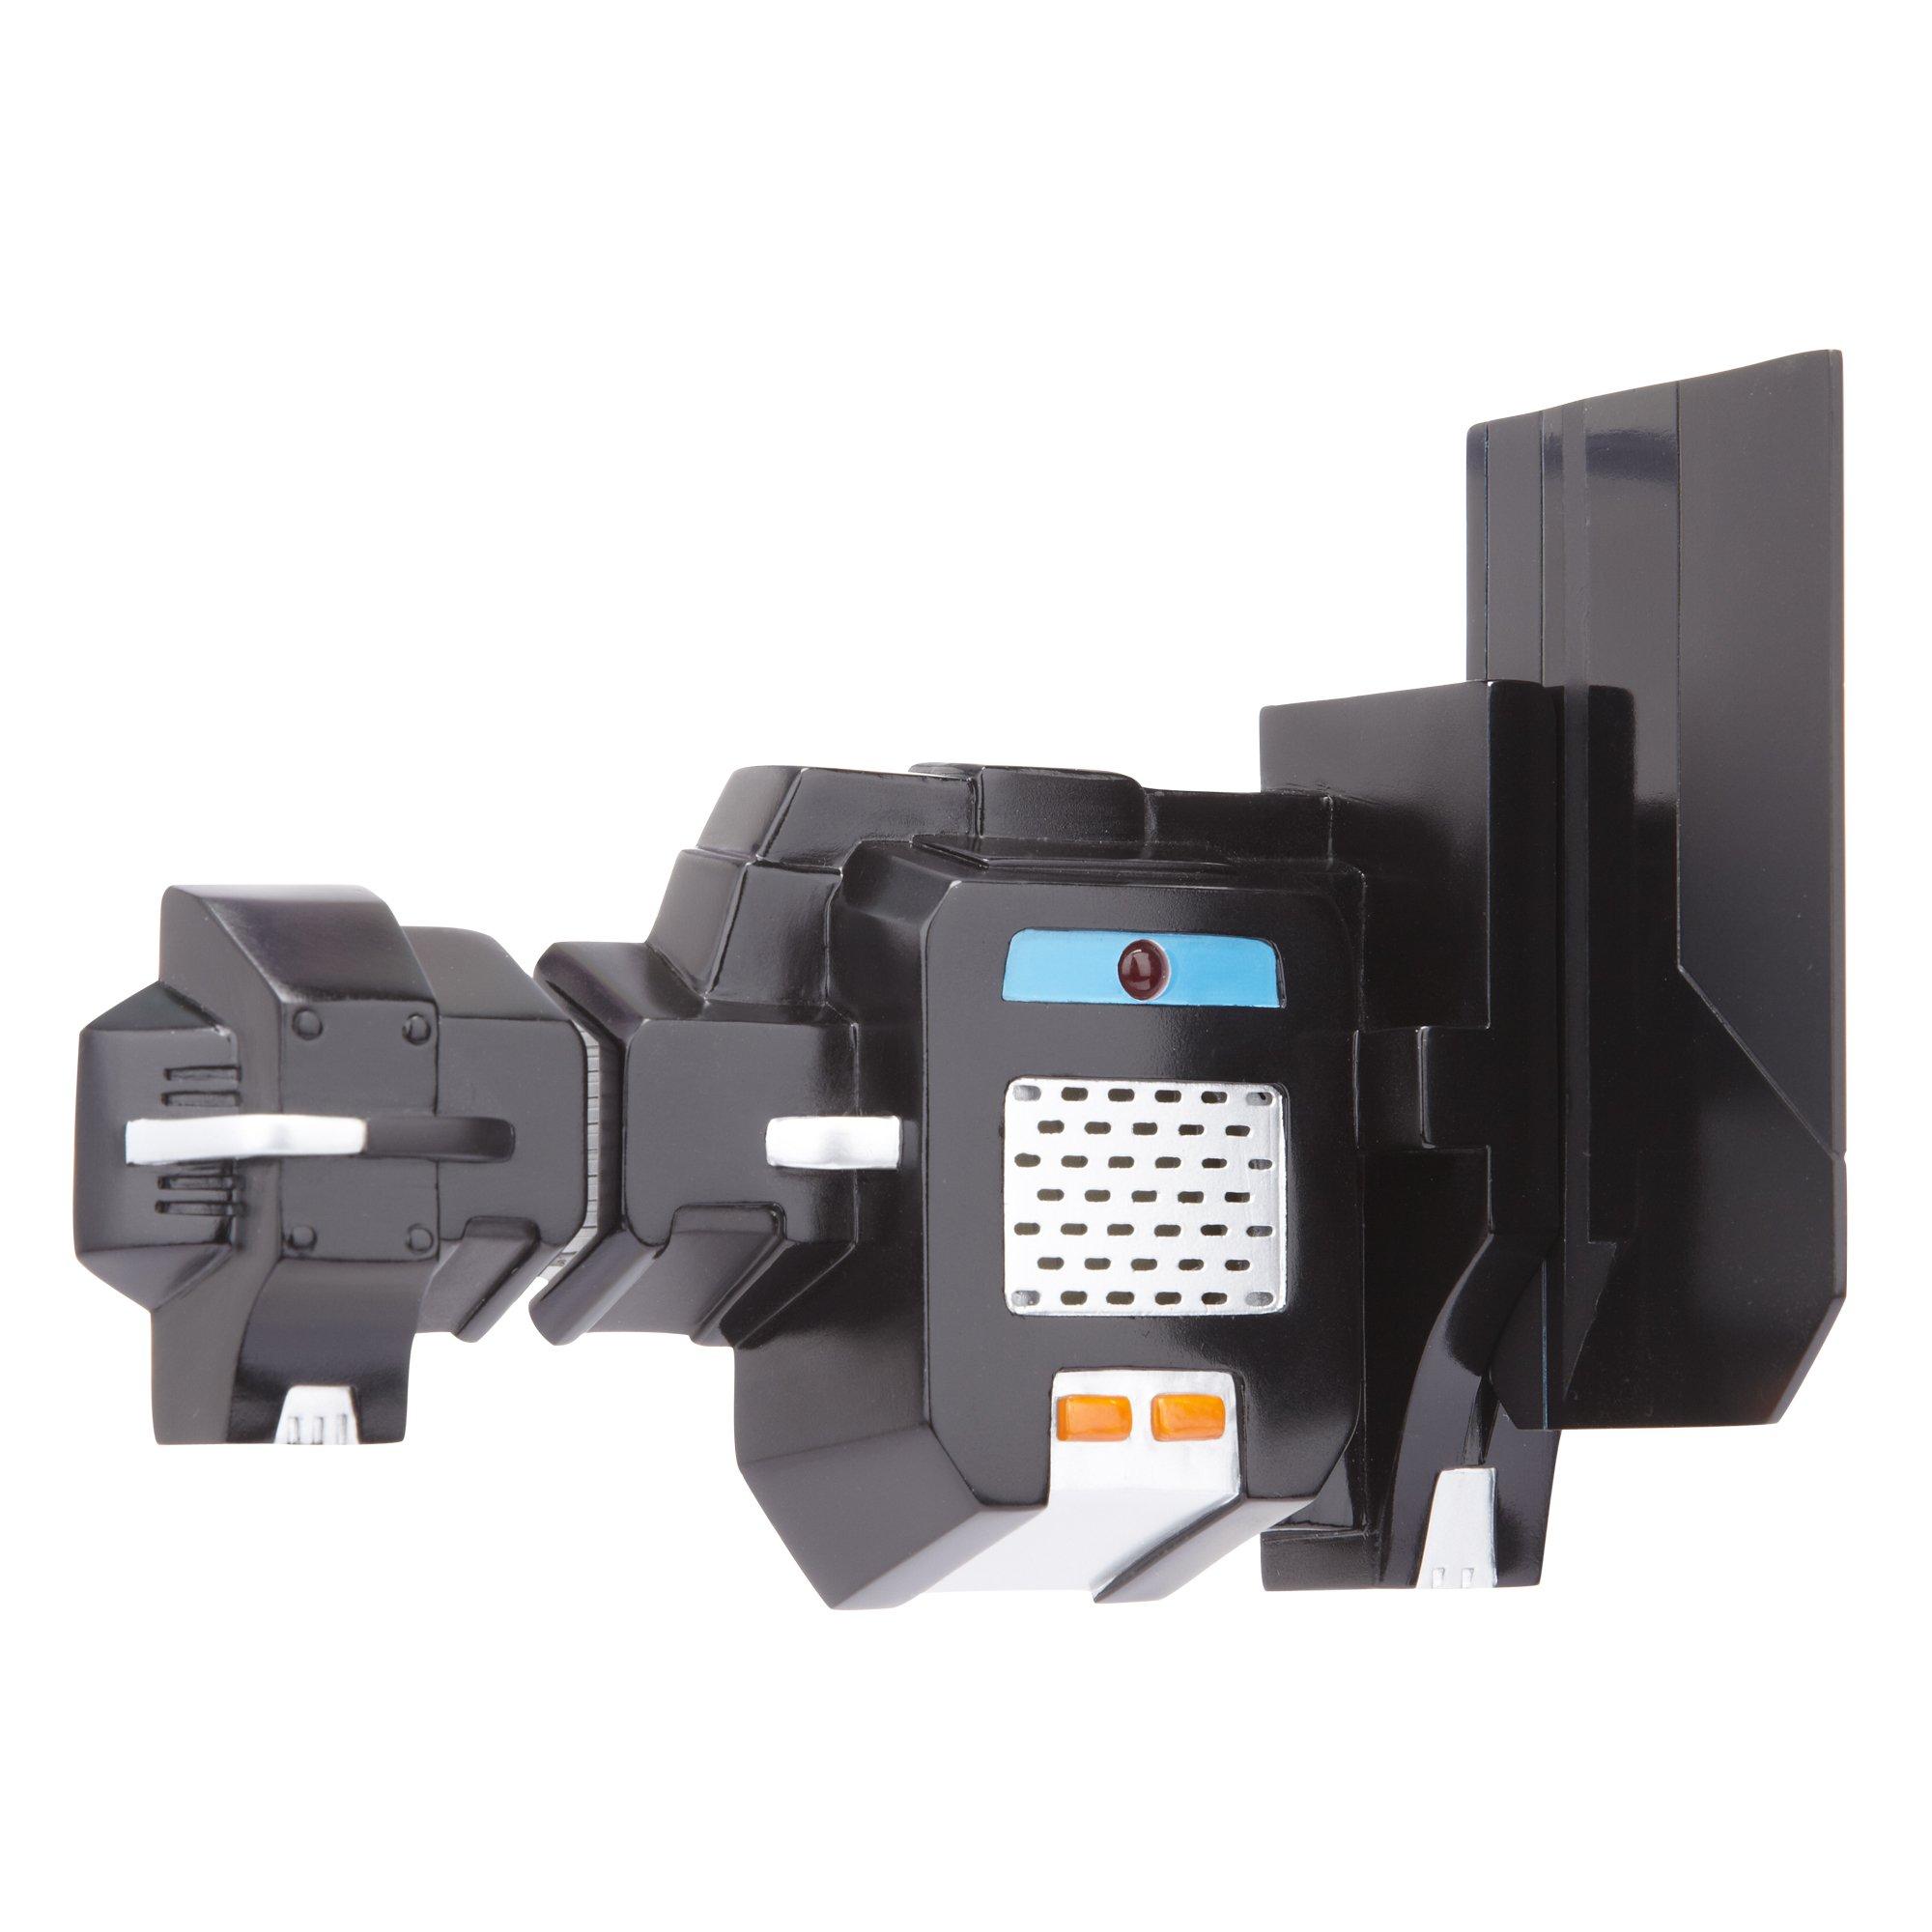 SpyNet Door Alarm by SpyNet (Image #1)